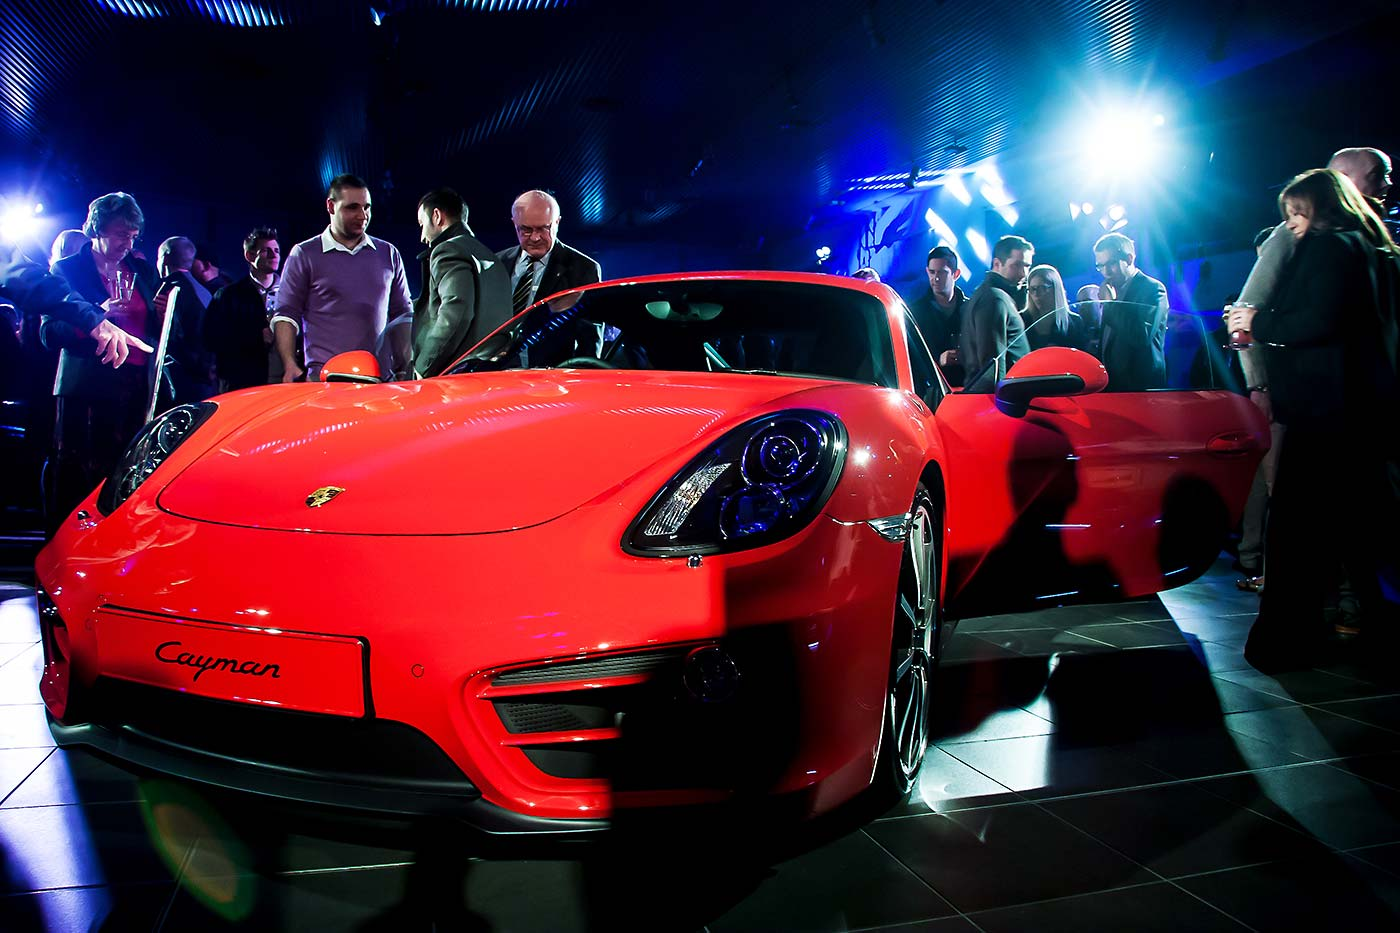 Porsche Cayman S launch at Hatfield Porsche showroom.